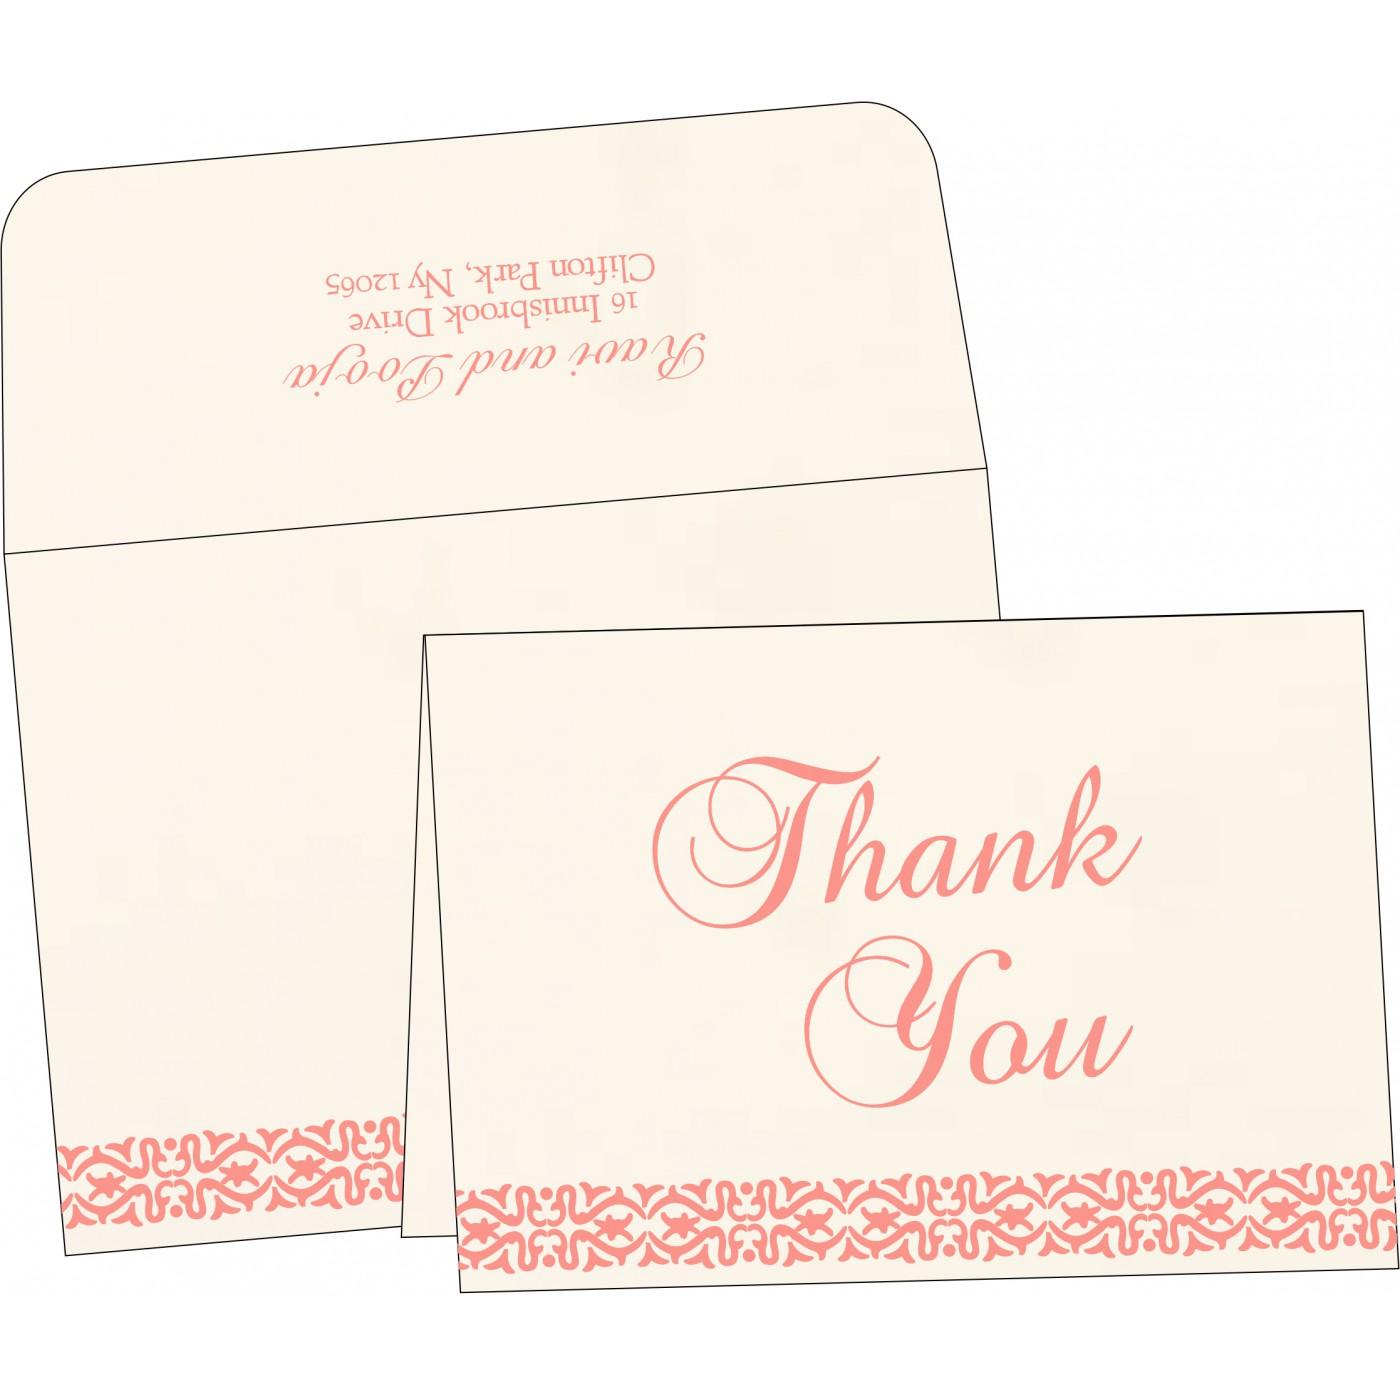 Thank You Cards : TYC-1221 - 123WeddingCards